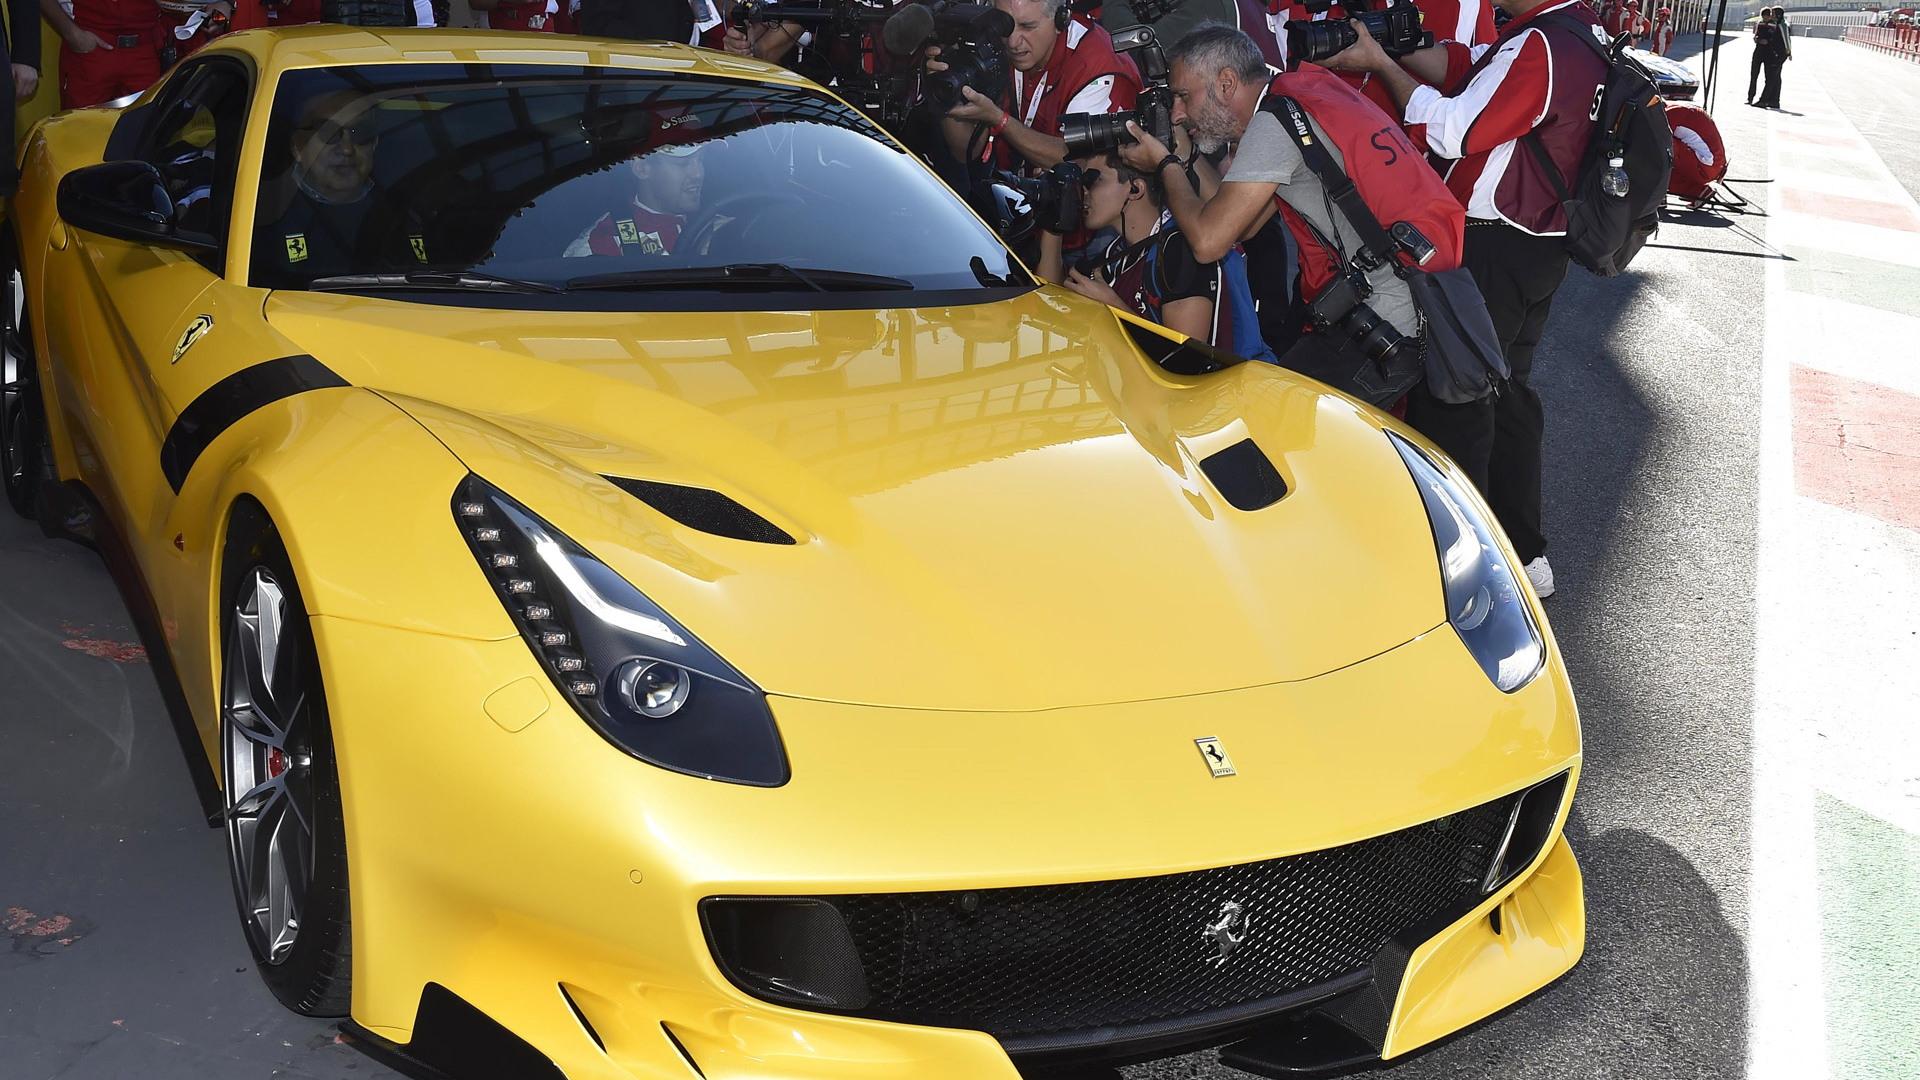 Ferrari F12 tdf, 2015 Finali Mondiali